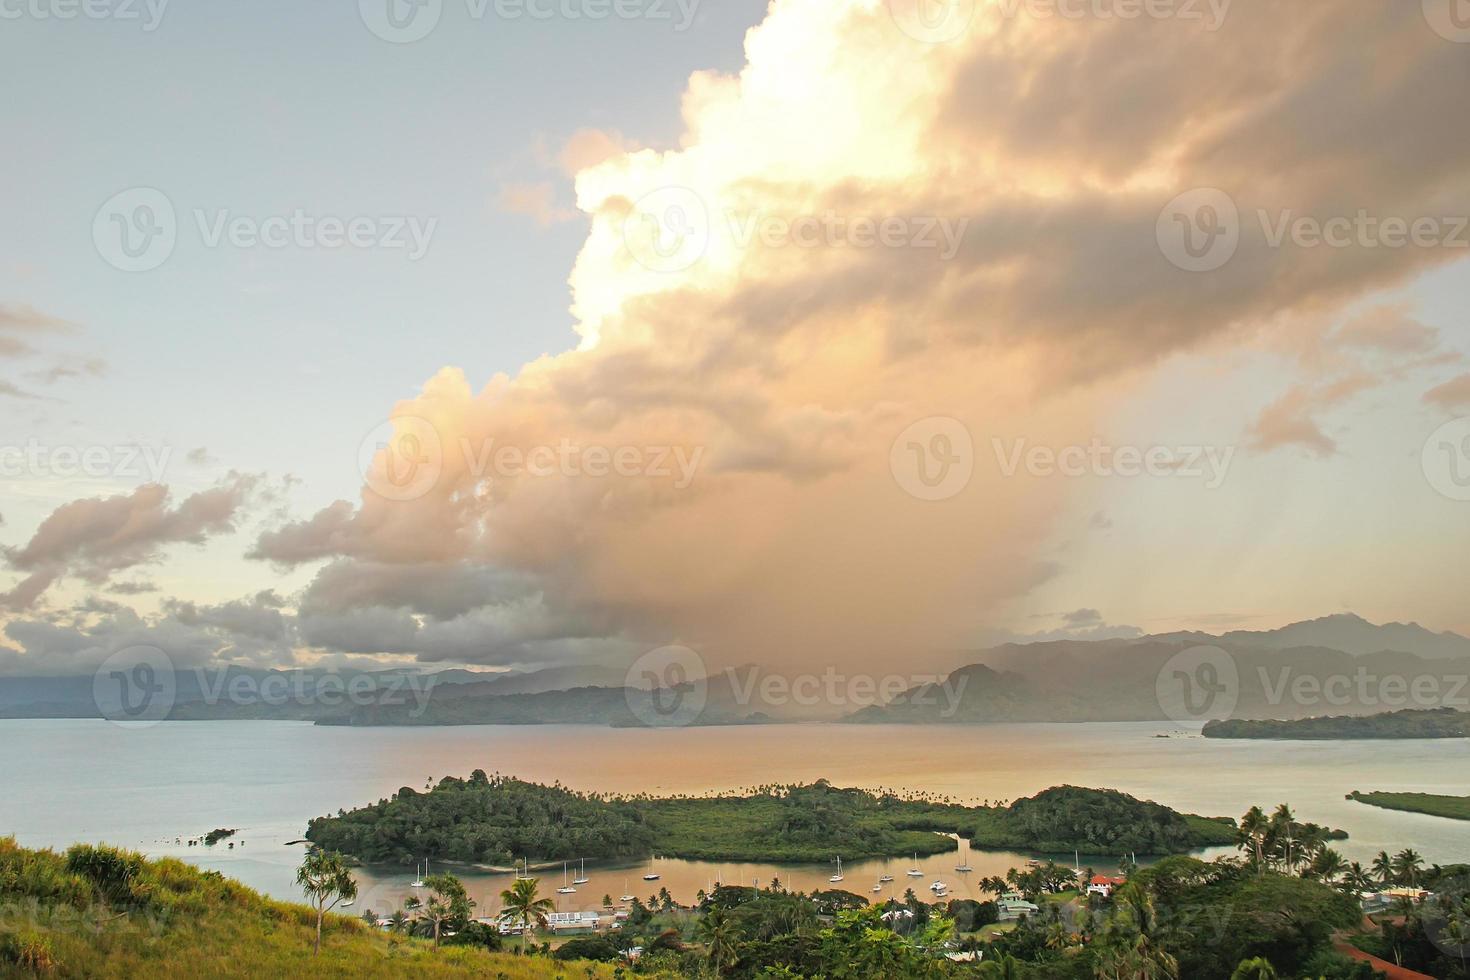 Savusavu marina and Nawi islet, Vanua Levu island, Fiji photo